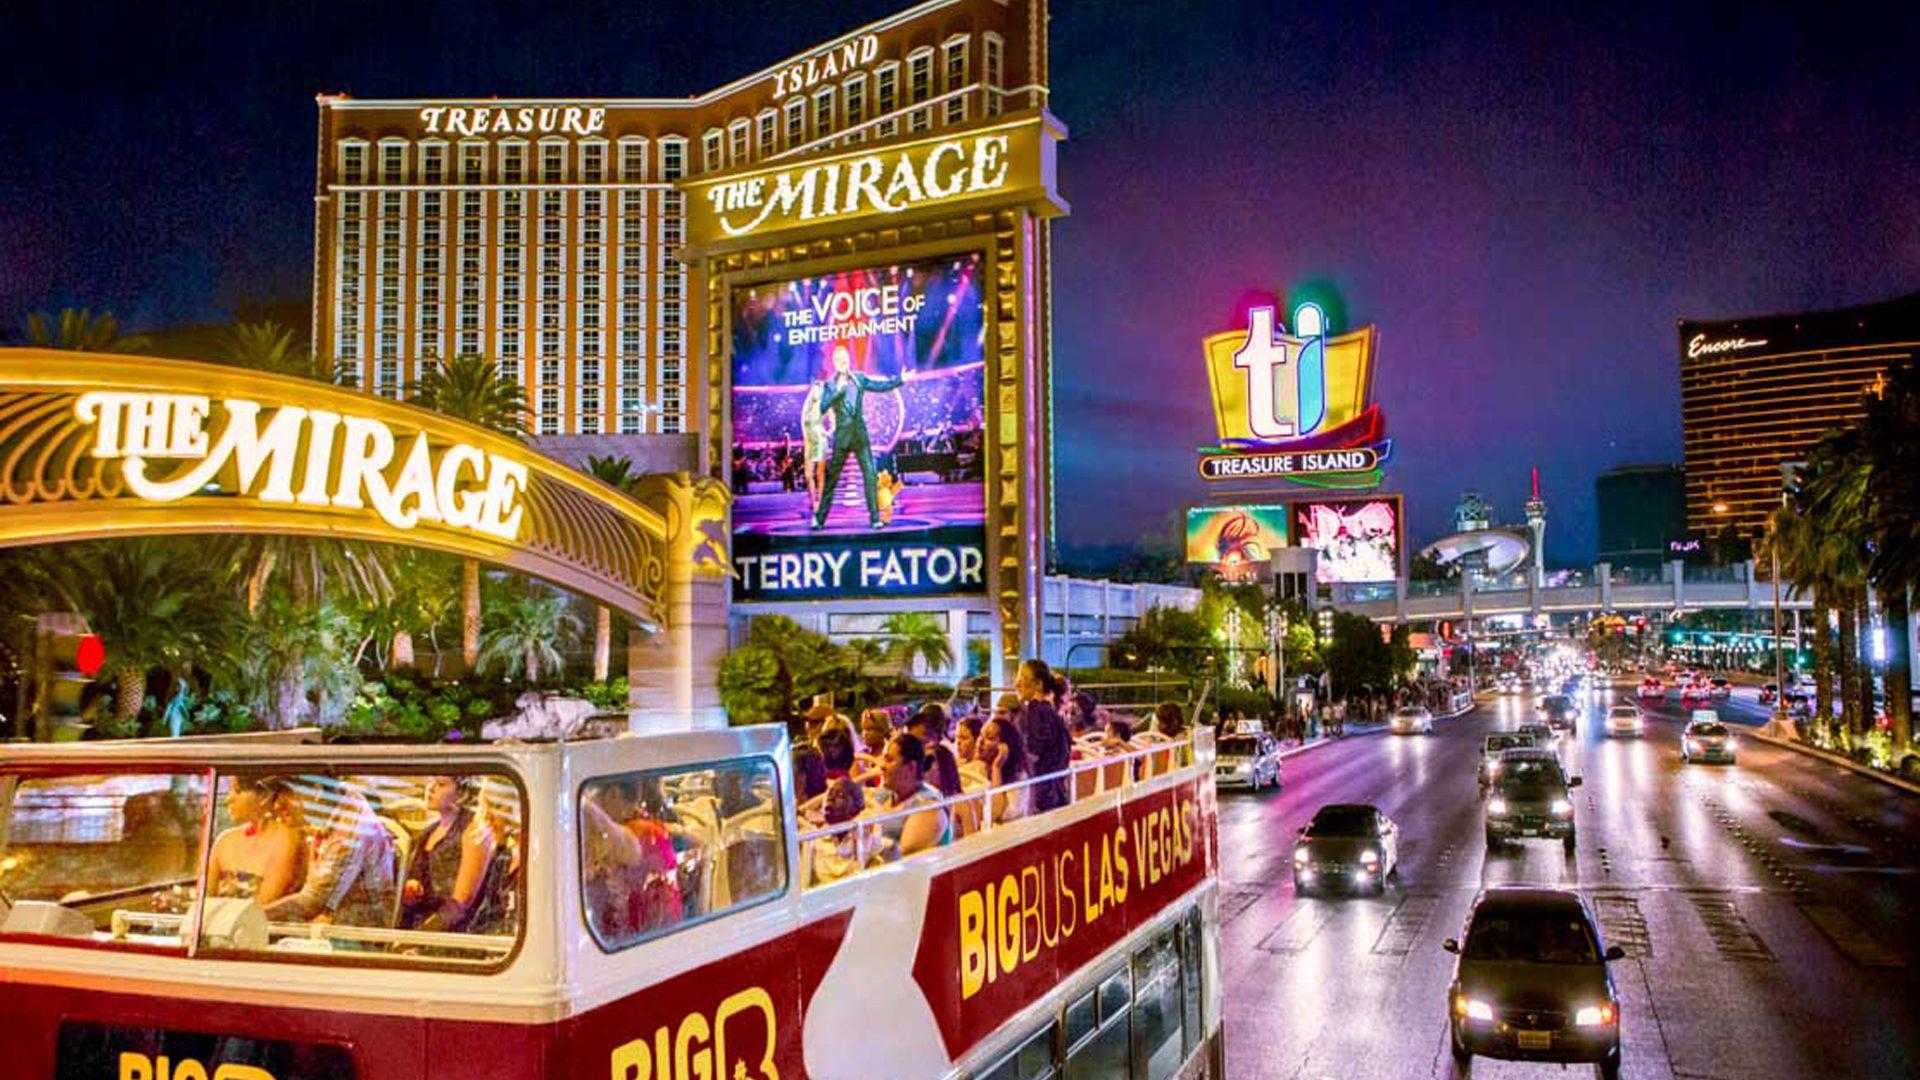 Treasure Island Ti Hotel Casino Las Vegas Strip Wallpaper Hd 1920x1080